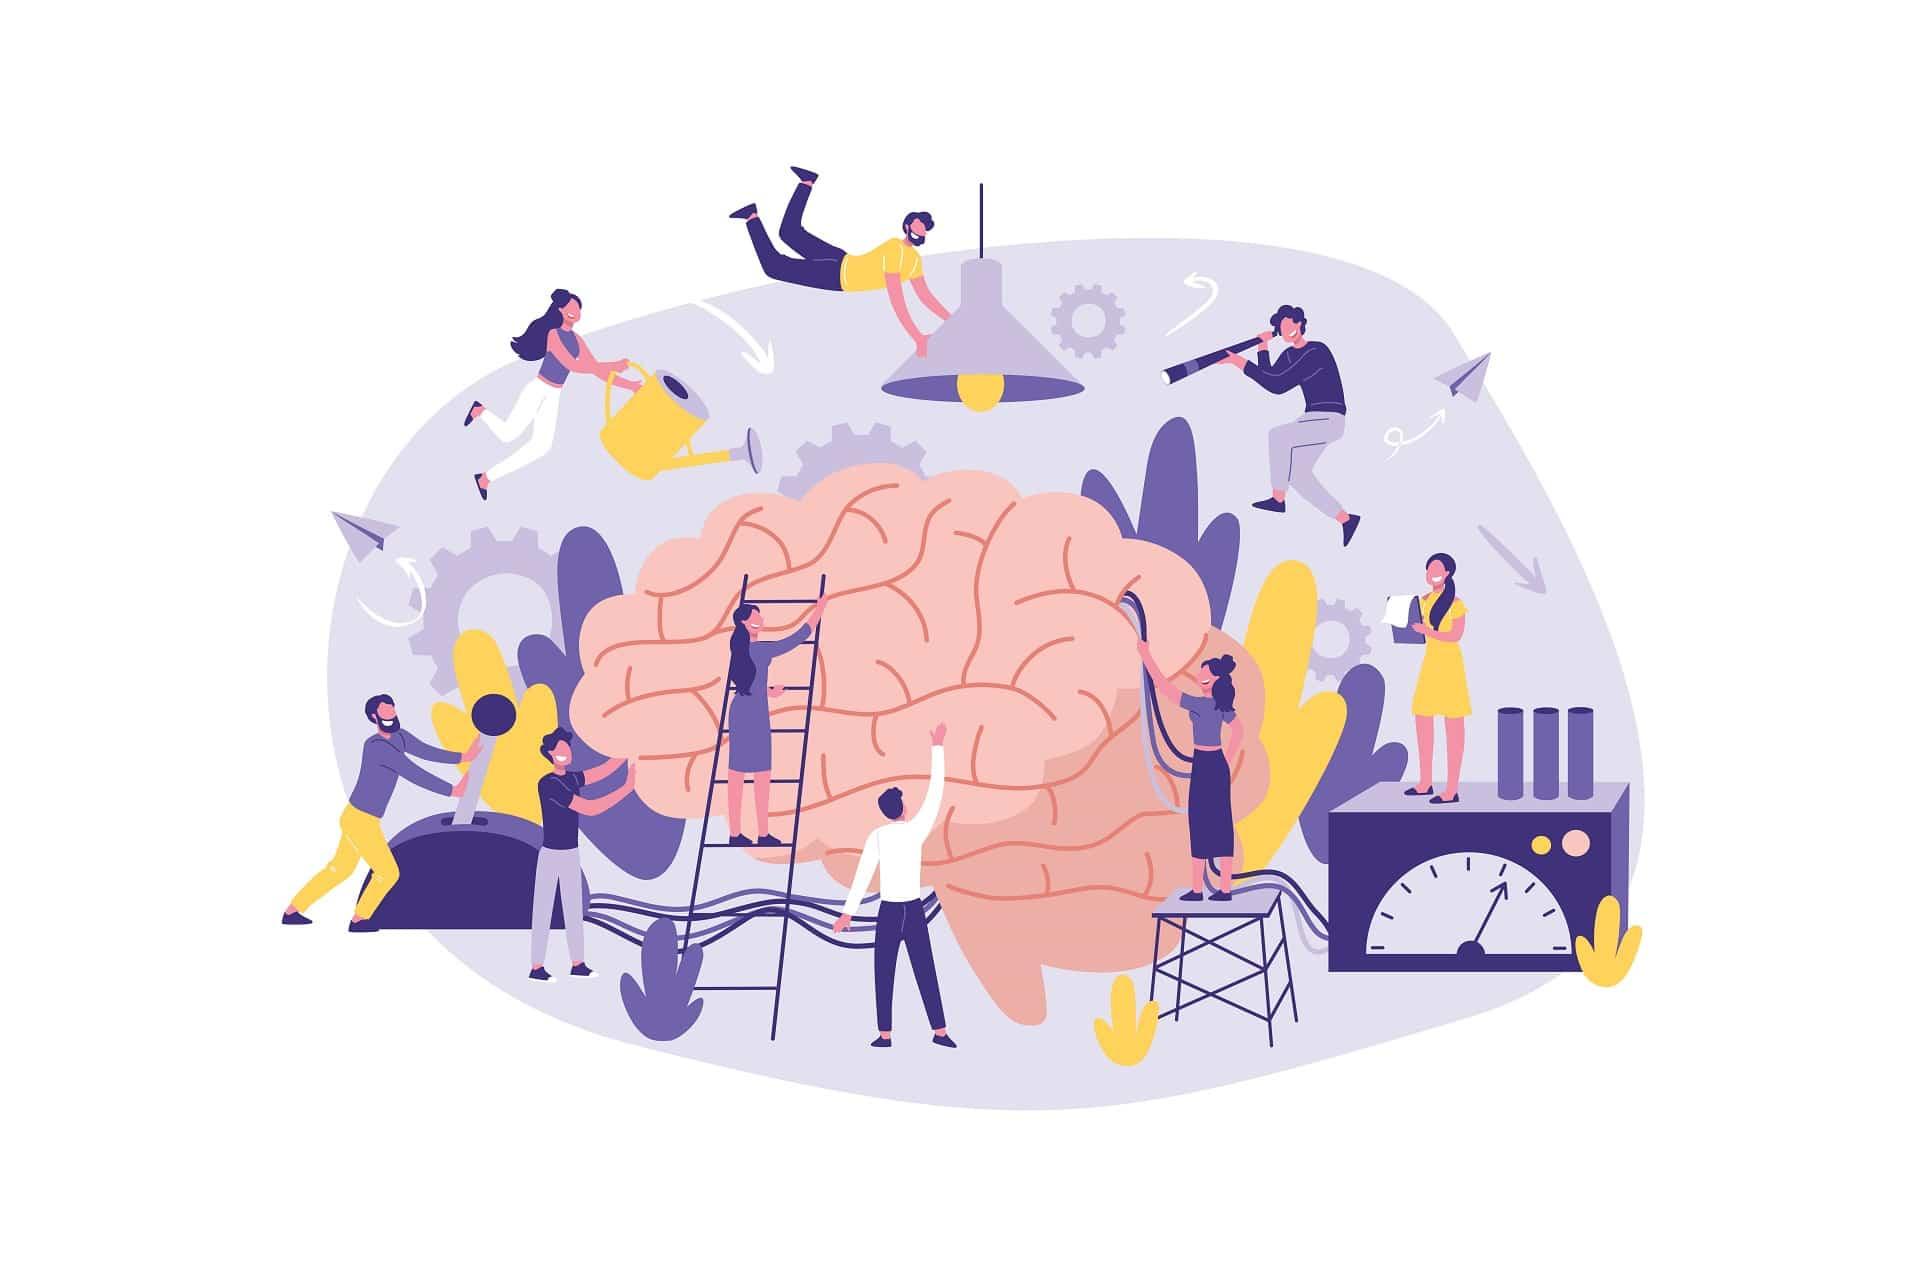 Neuromarketing para realizar campañas efectivas en pandemia